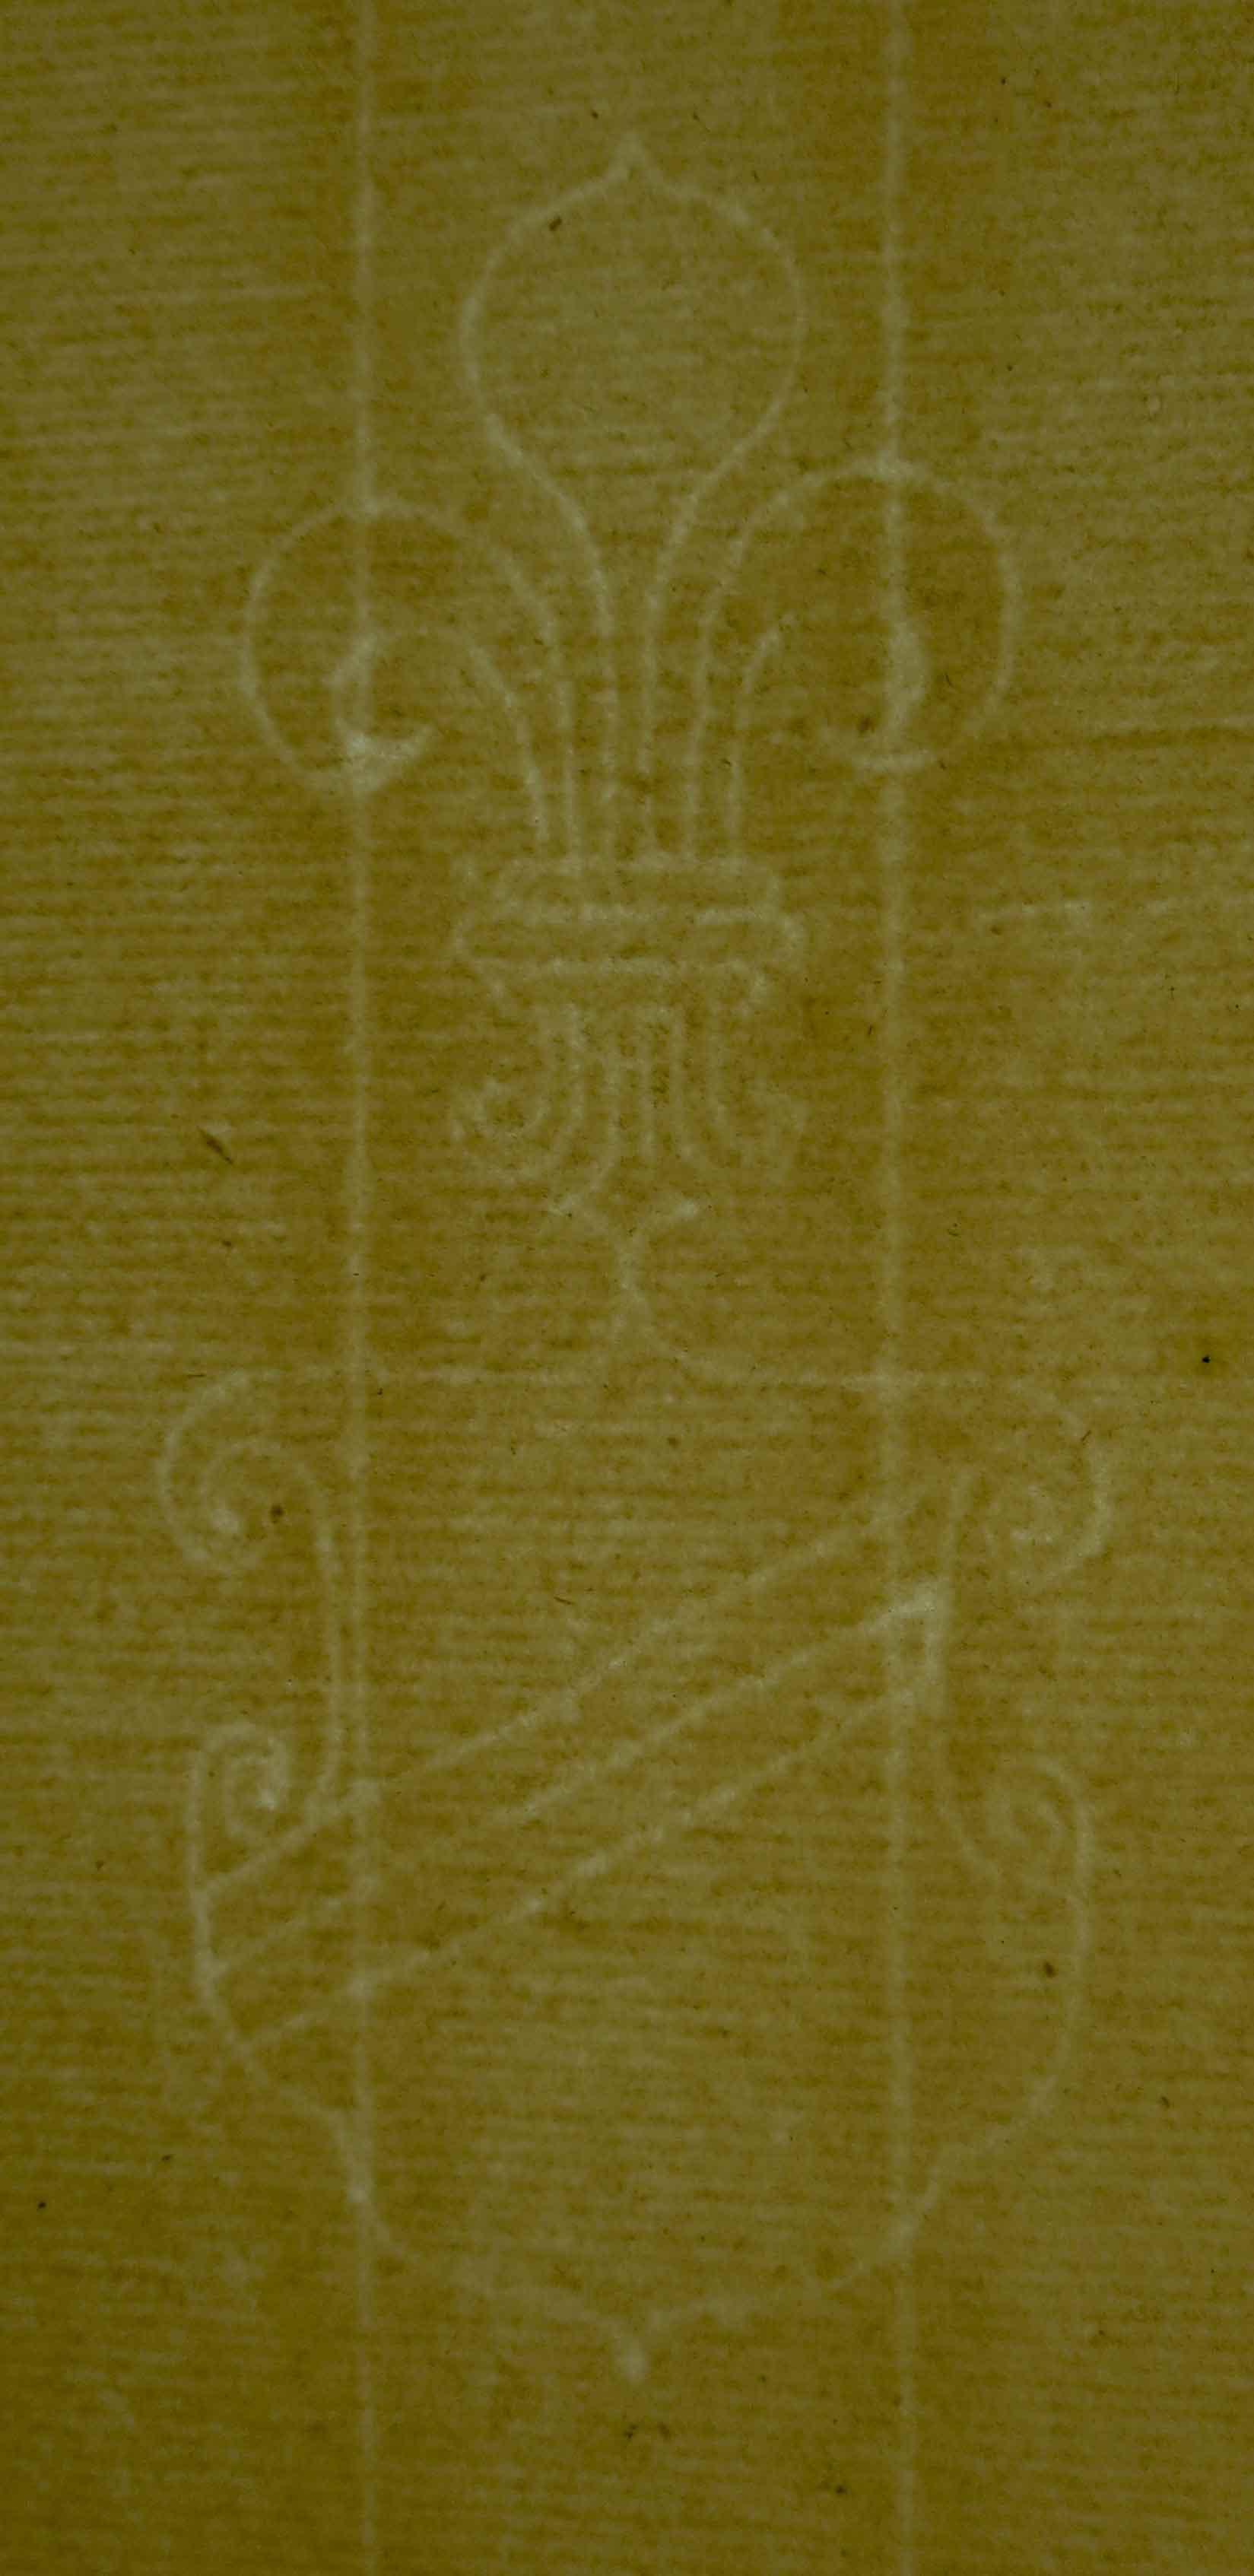 Beneath the Surface Watermarks and Flayed Figures in Cushings Manuscript of Jacob van der